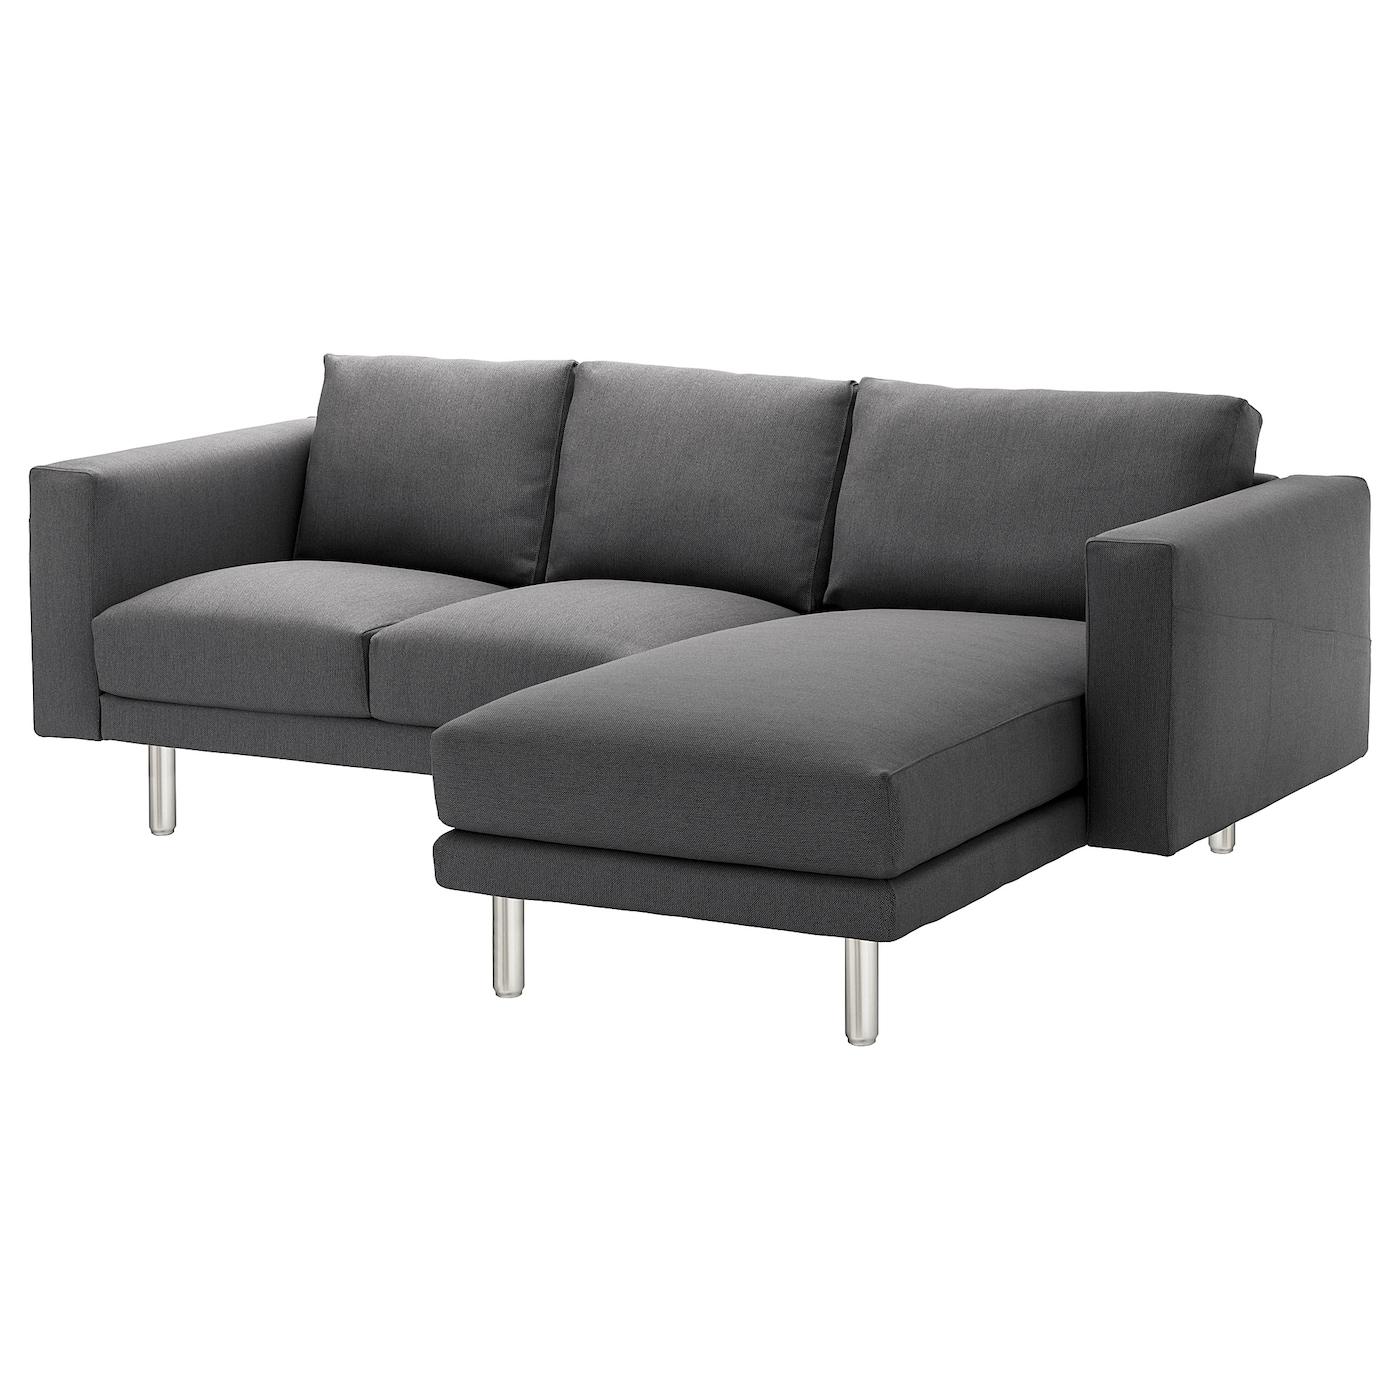 norsborg 3 seat sofa with chaise longue finnsta dark grey metal ikea. Black Bedroom Furniture Sets. Home Design Ideas